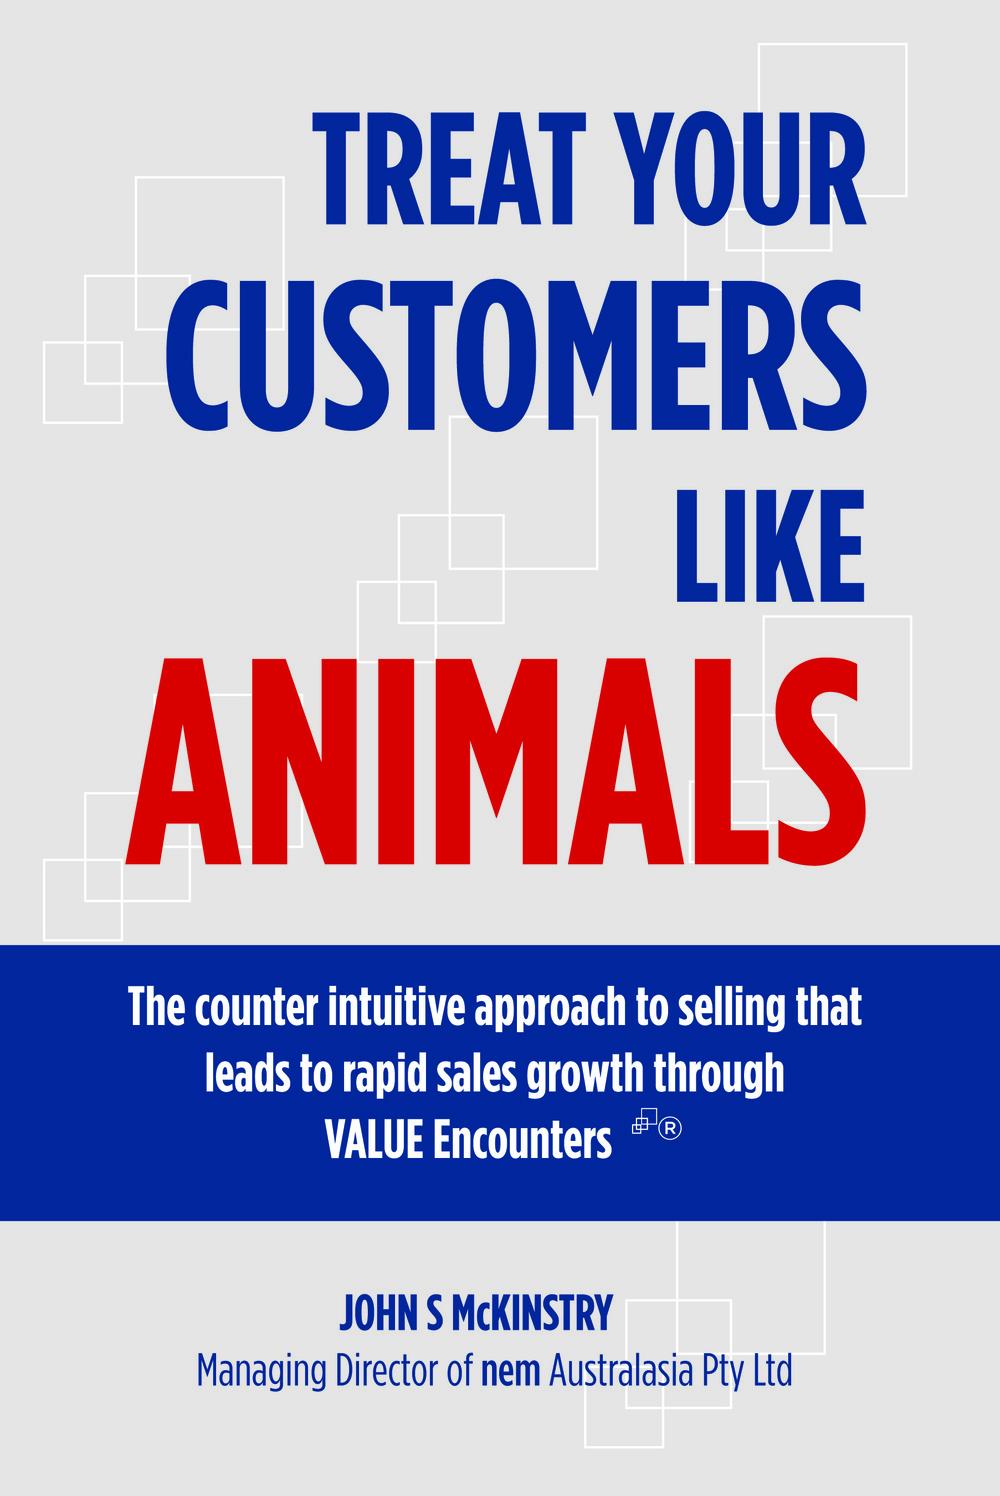 Treat Your Customers Like Animals.jpg